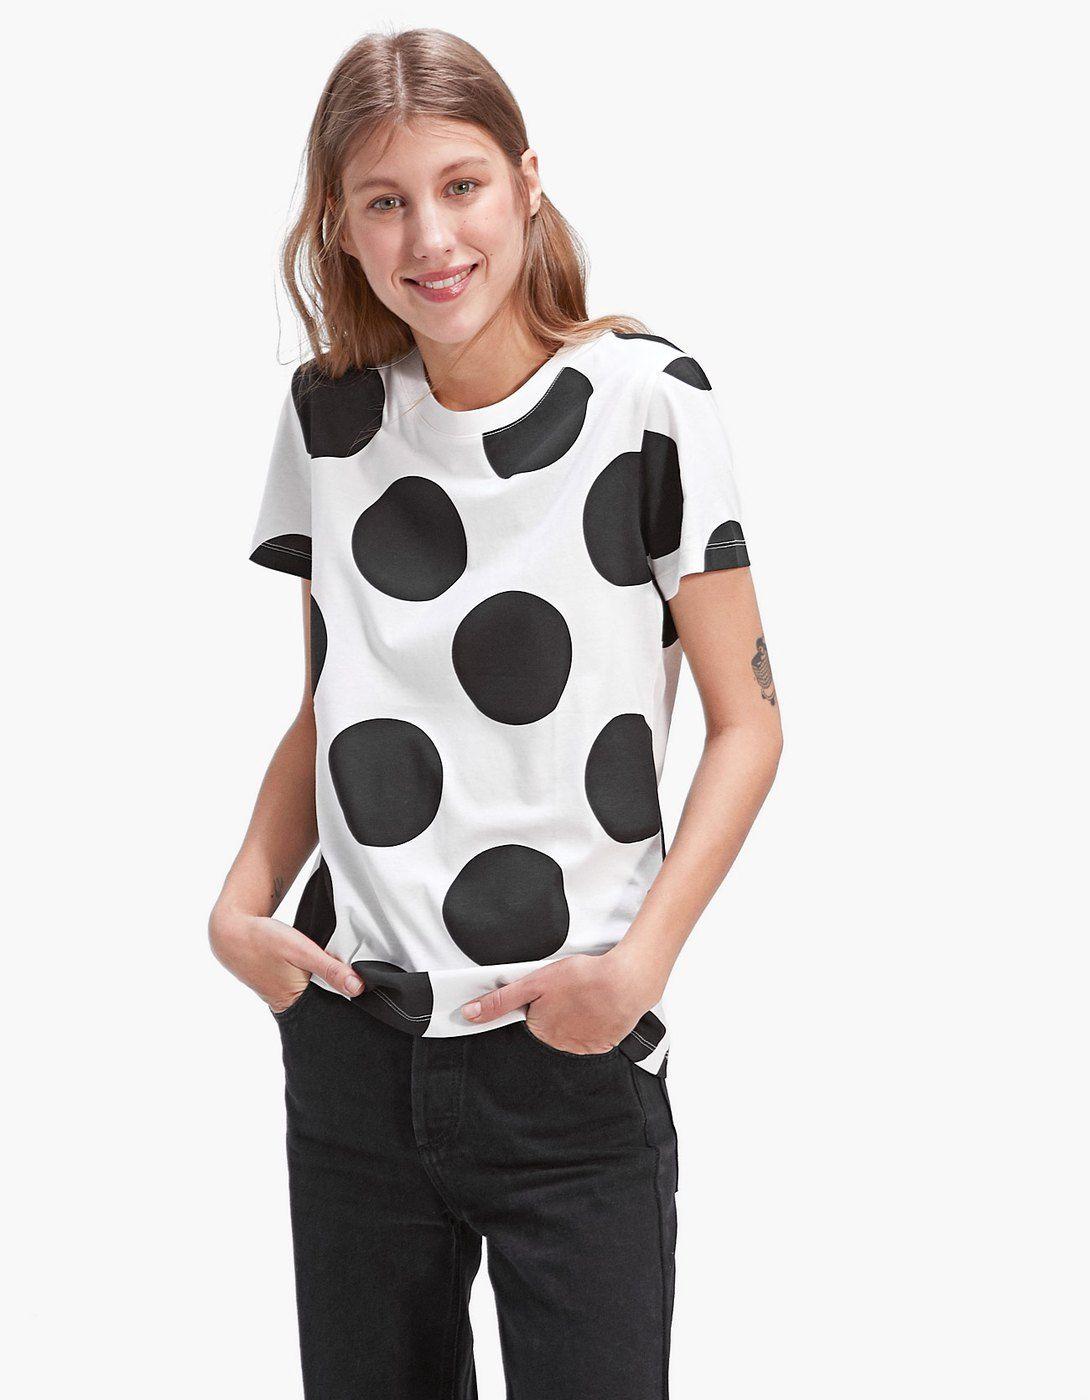 395bdc18b4e Short sleeve T-shirt with large polka dots - Dots a lot ...